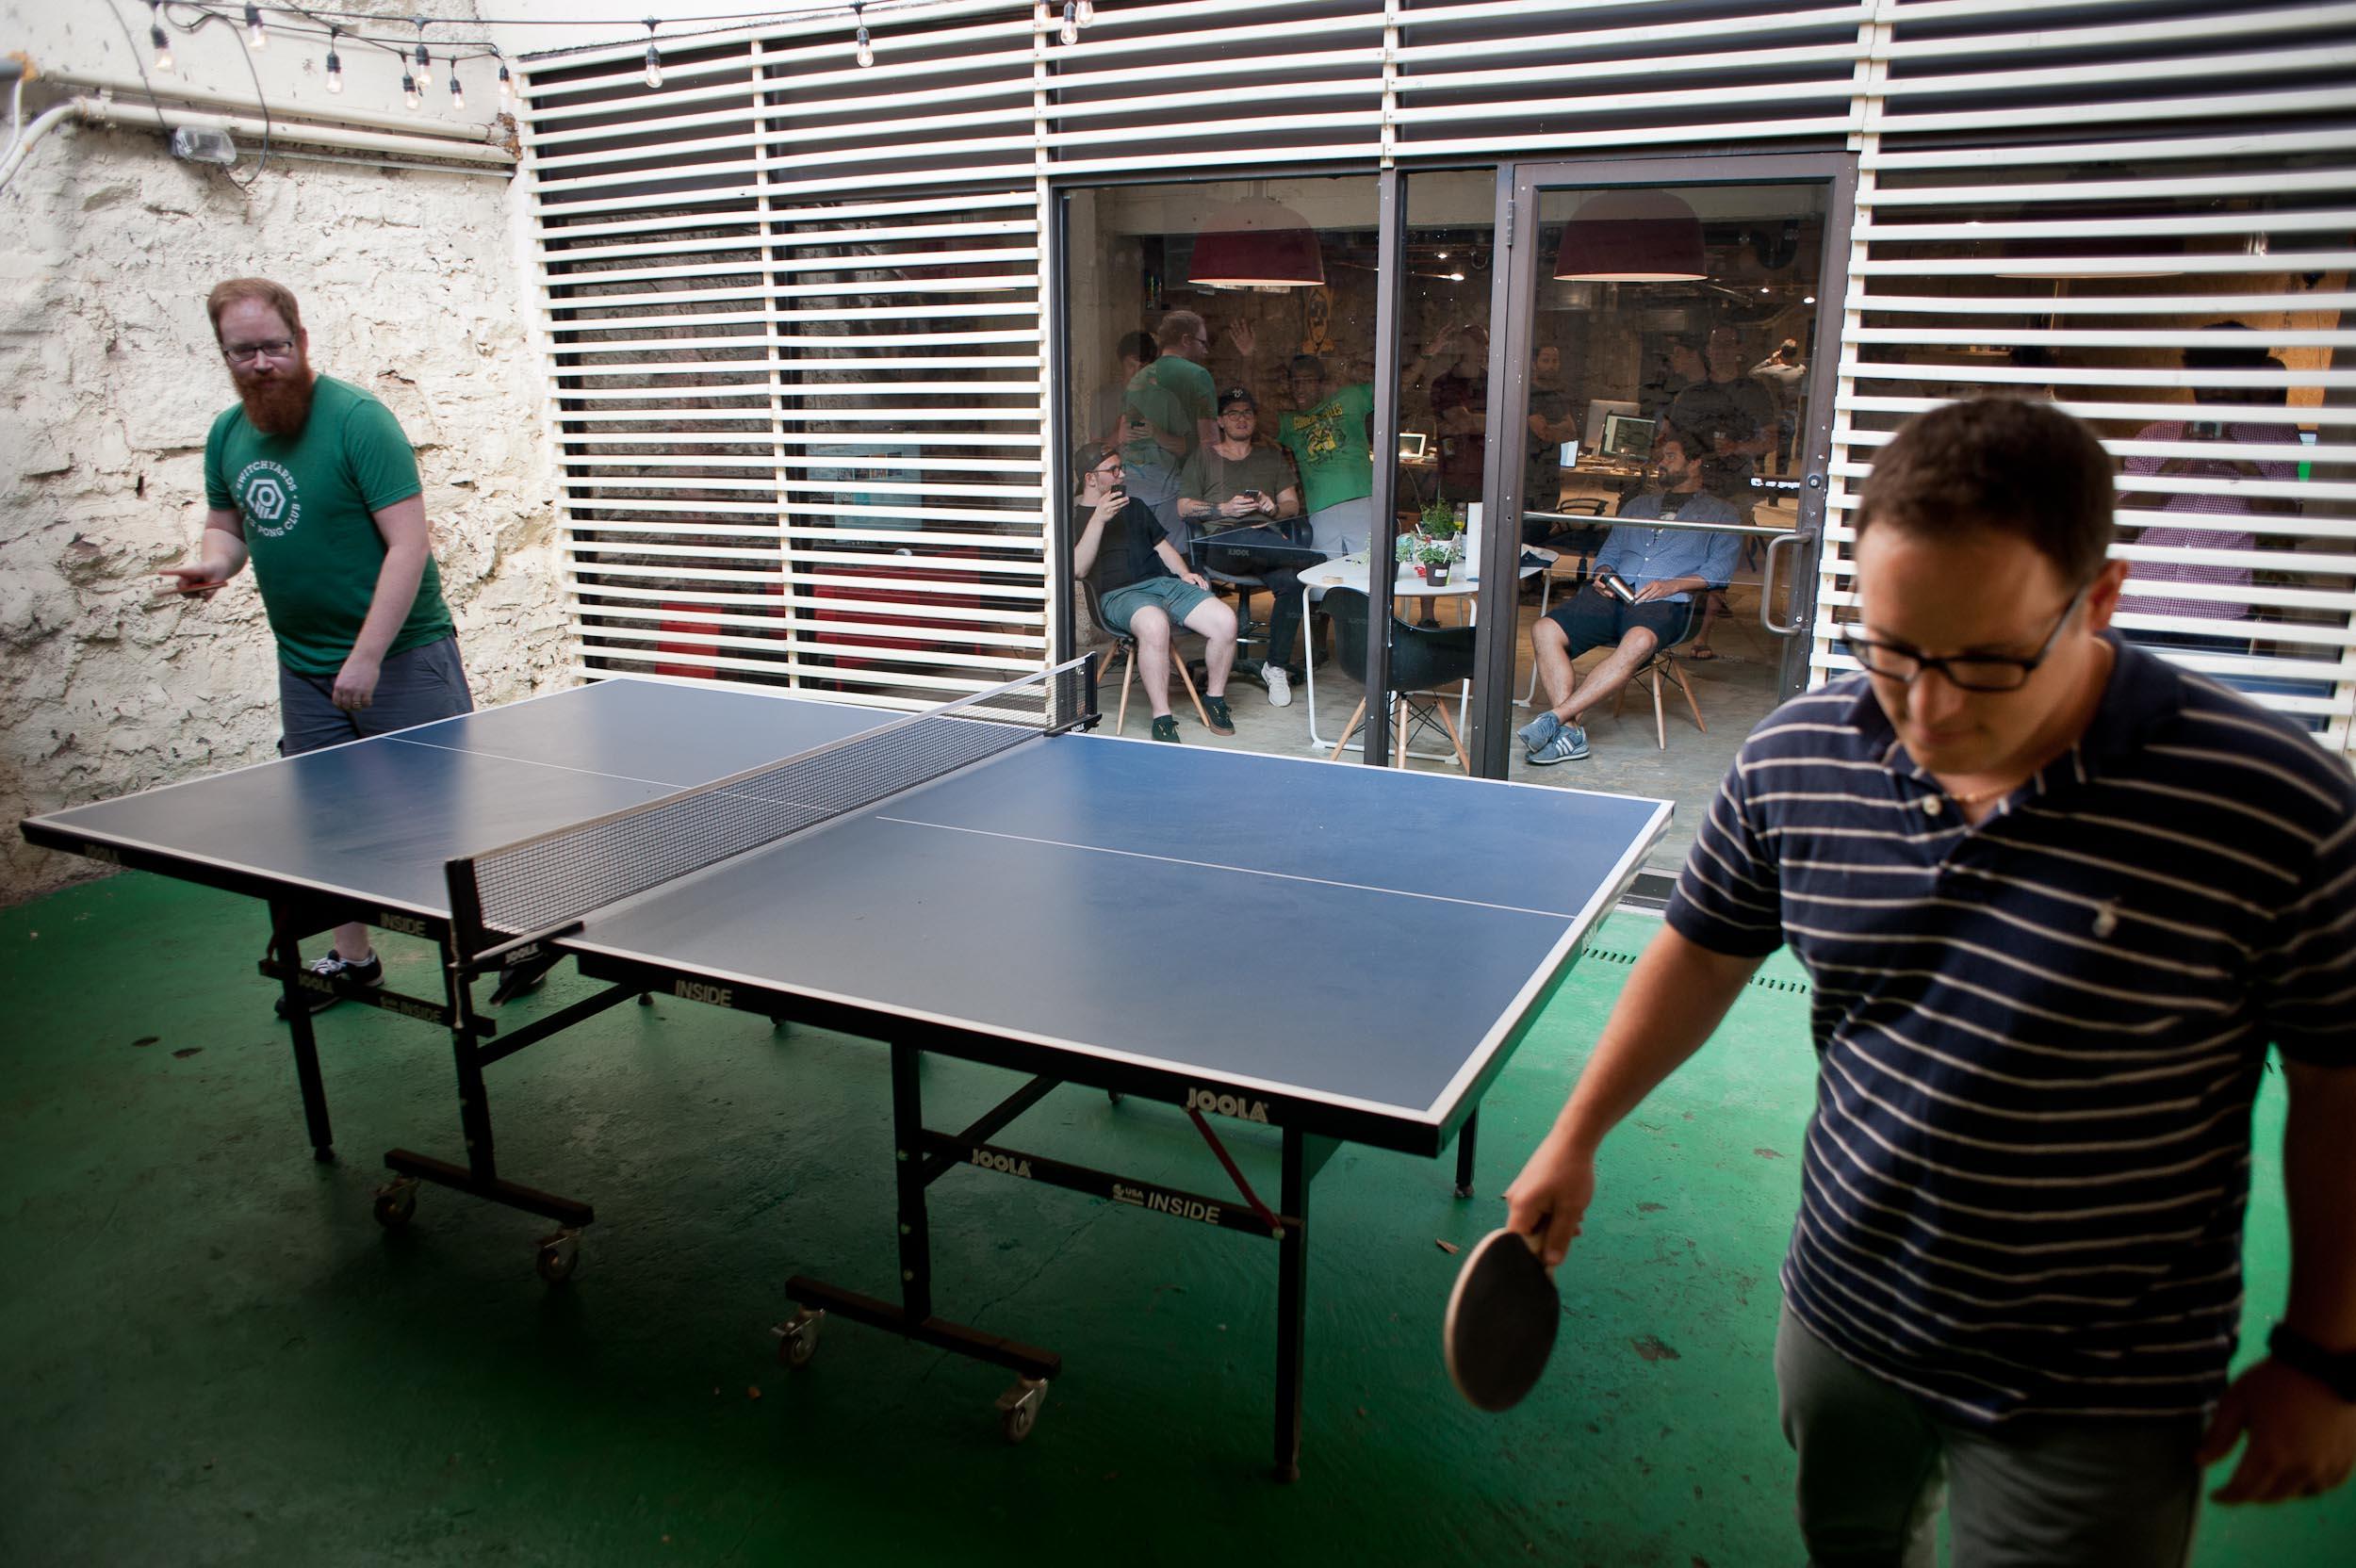 SDC Ping Pong Tournament 1.0 (Web Ready)_006.JPG